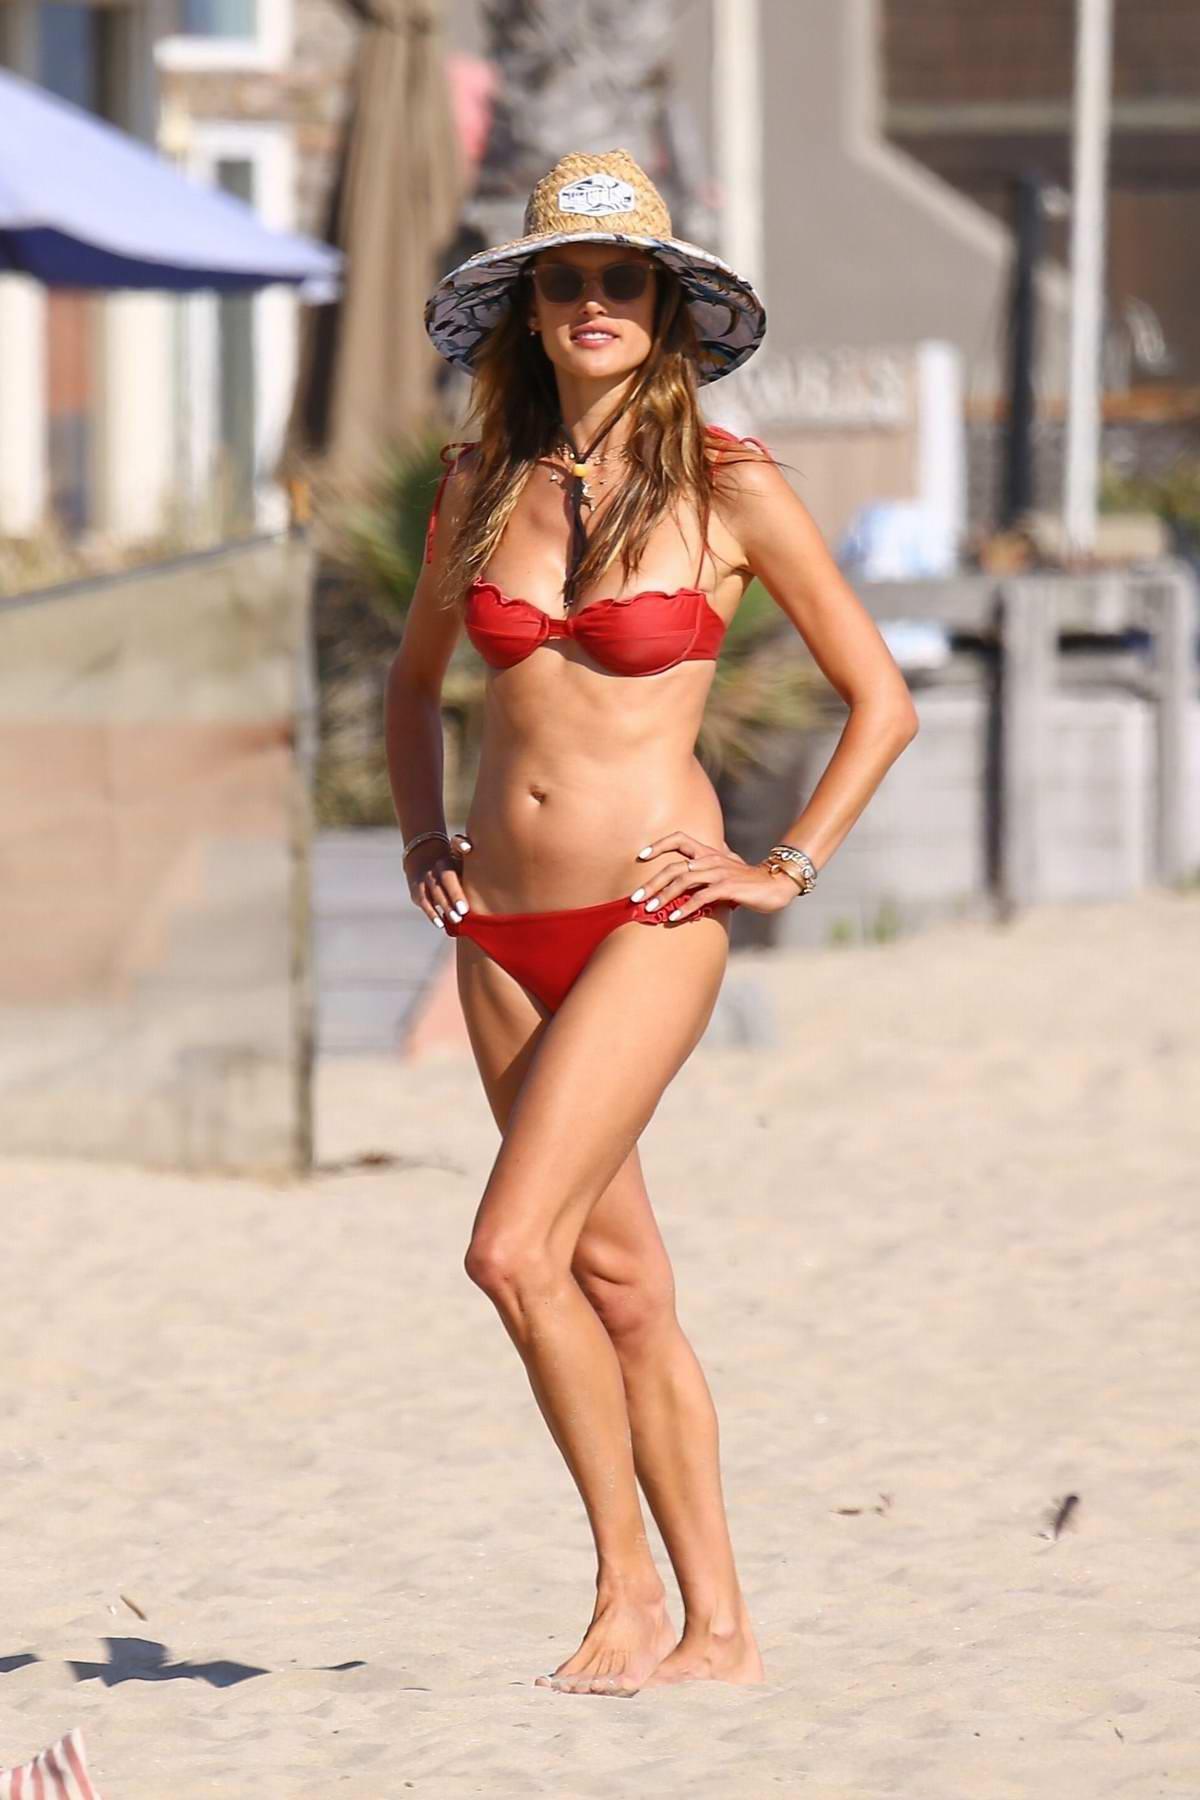 Alessandra Ambrosio looks incredible in a red bikini as she hits the beach in Marina del Rey, California